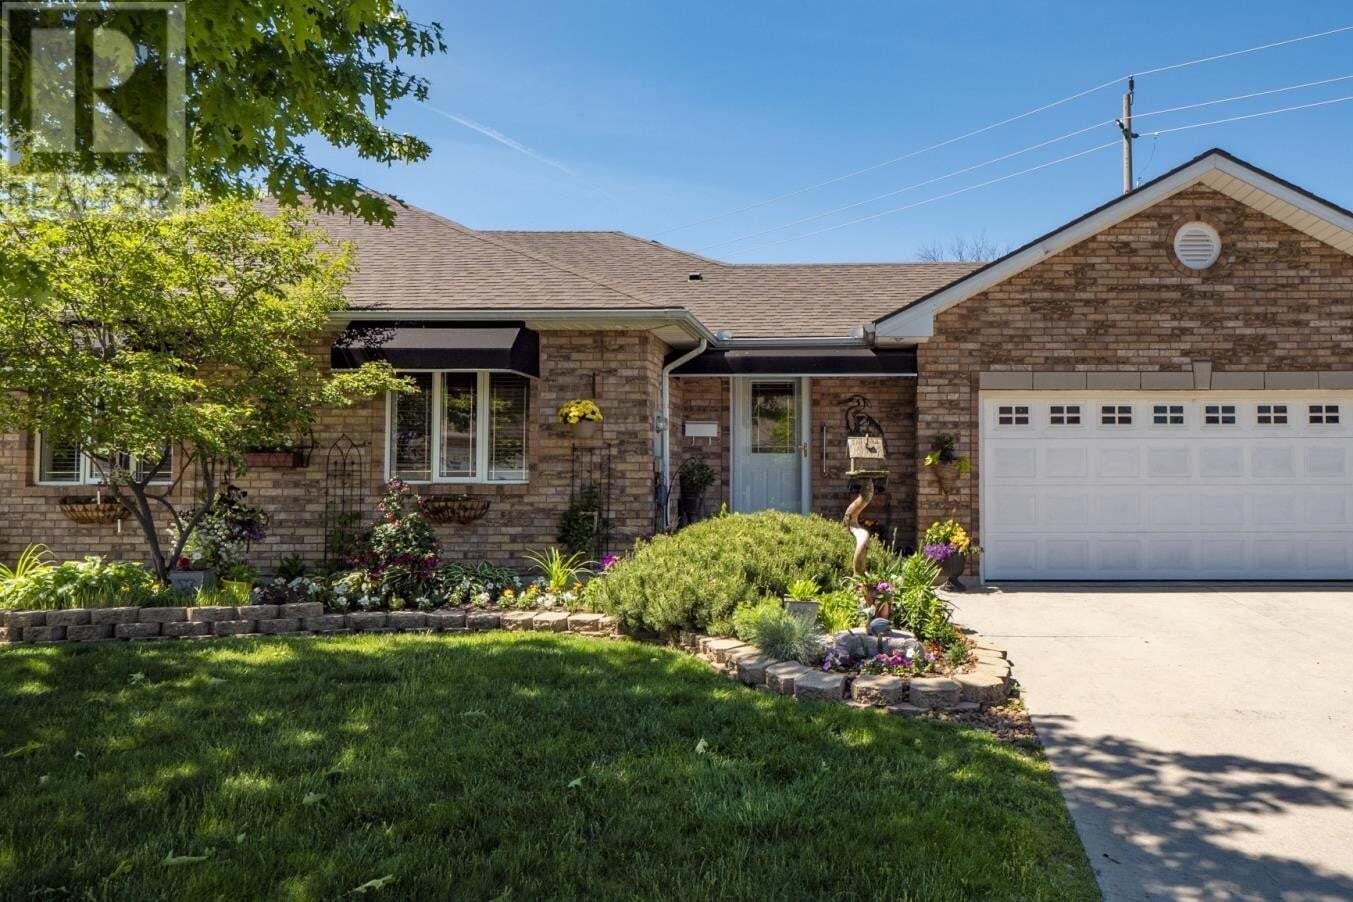 Townhouse for sale at 1275 Laurel Bay Ct Windsor Ontario - MLS: 20006233